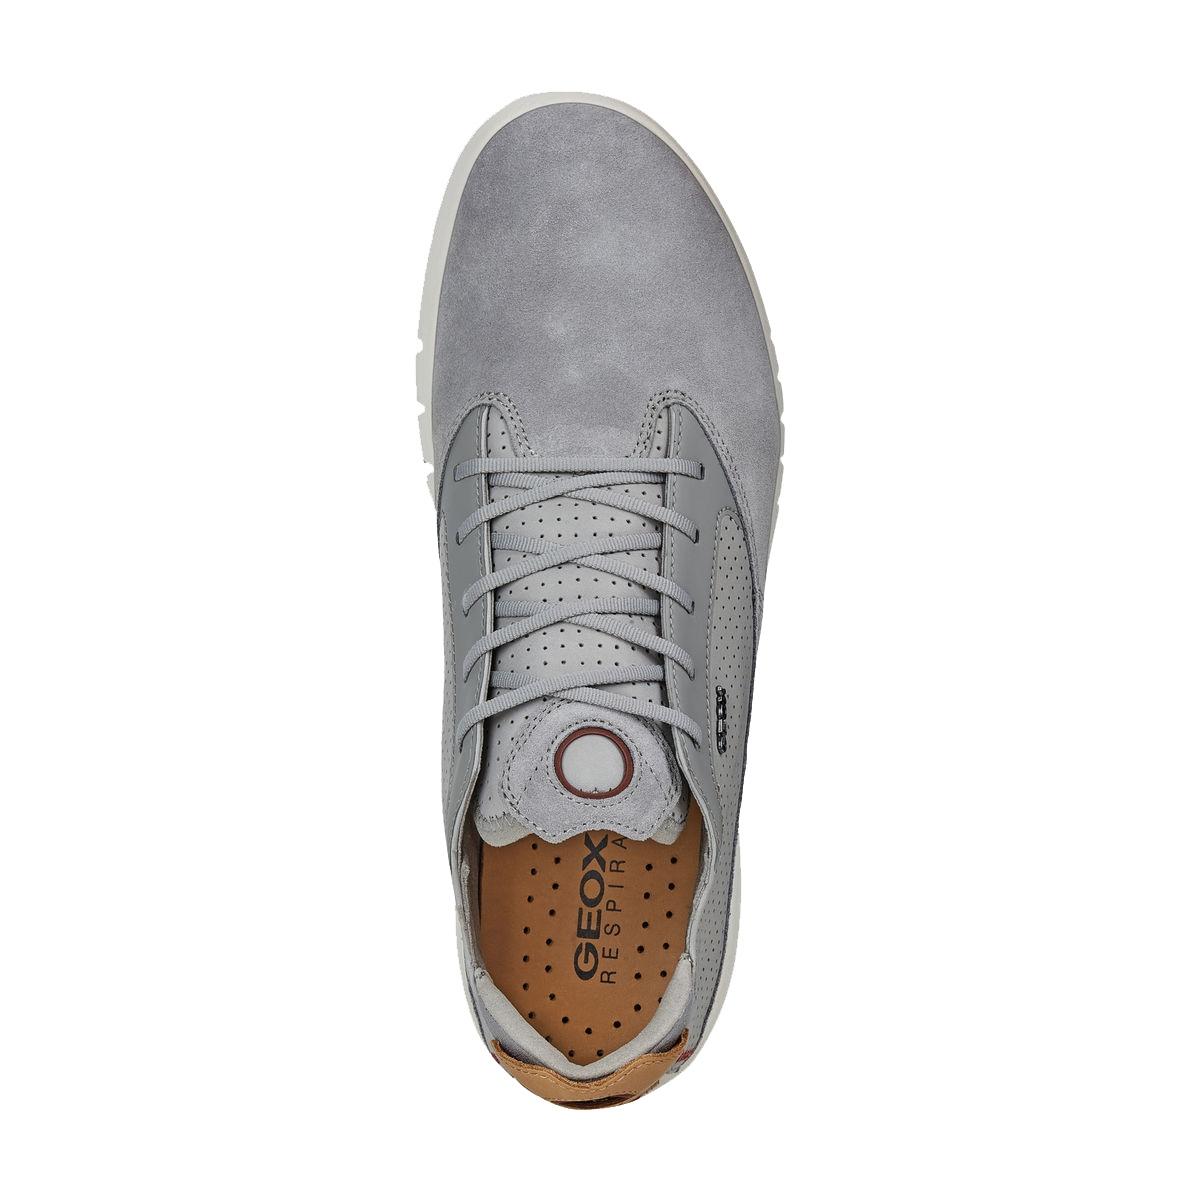 Geox TraspirantiEbay Aerantis Sneaker Ventilate U927fa Uomo